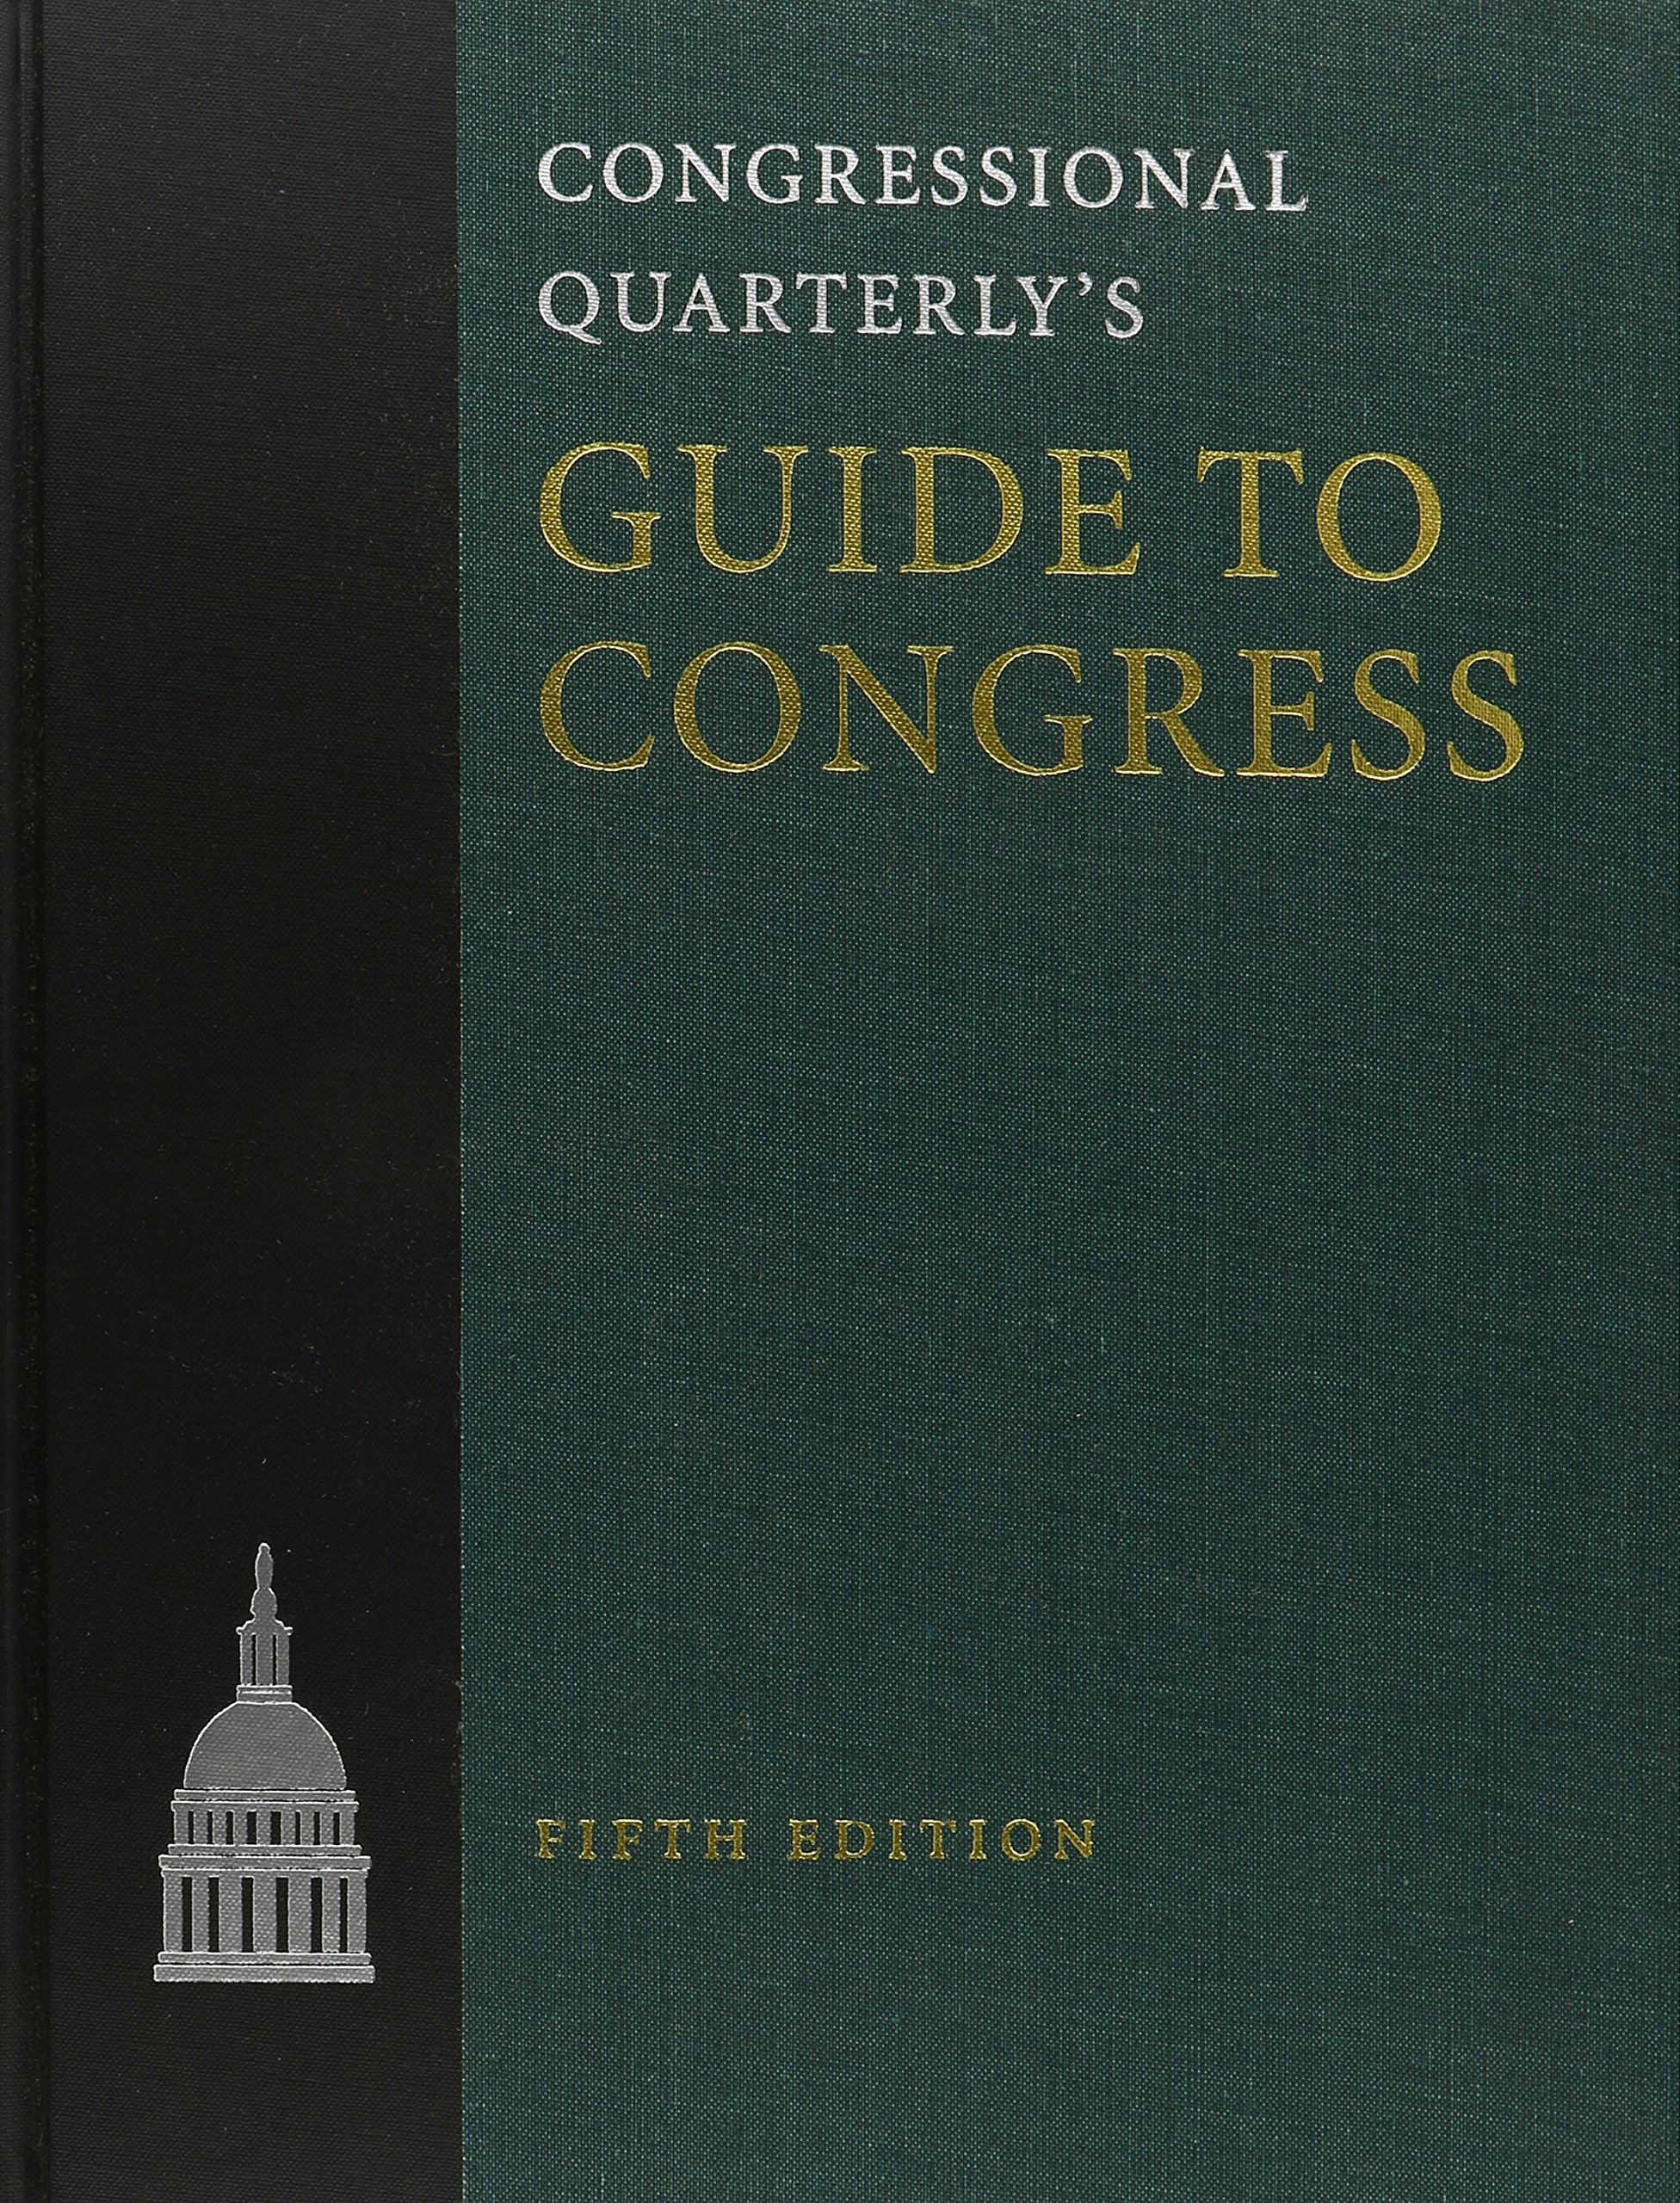 Download Congressional Quarterly's Guide to Congress (2 Volumes) pdf epub